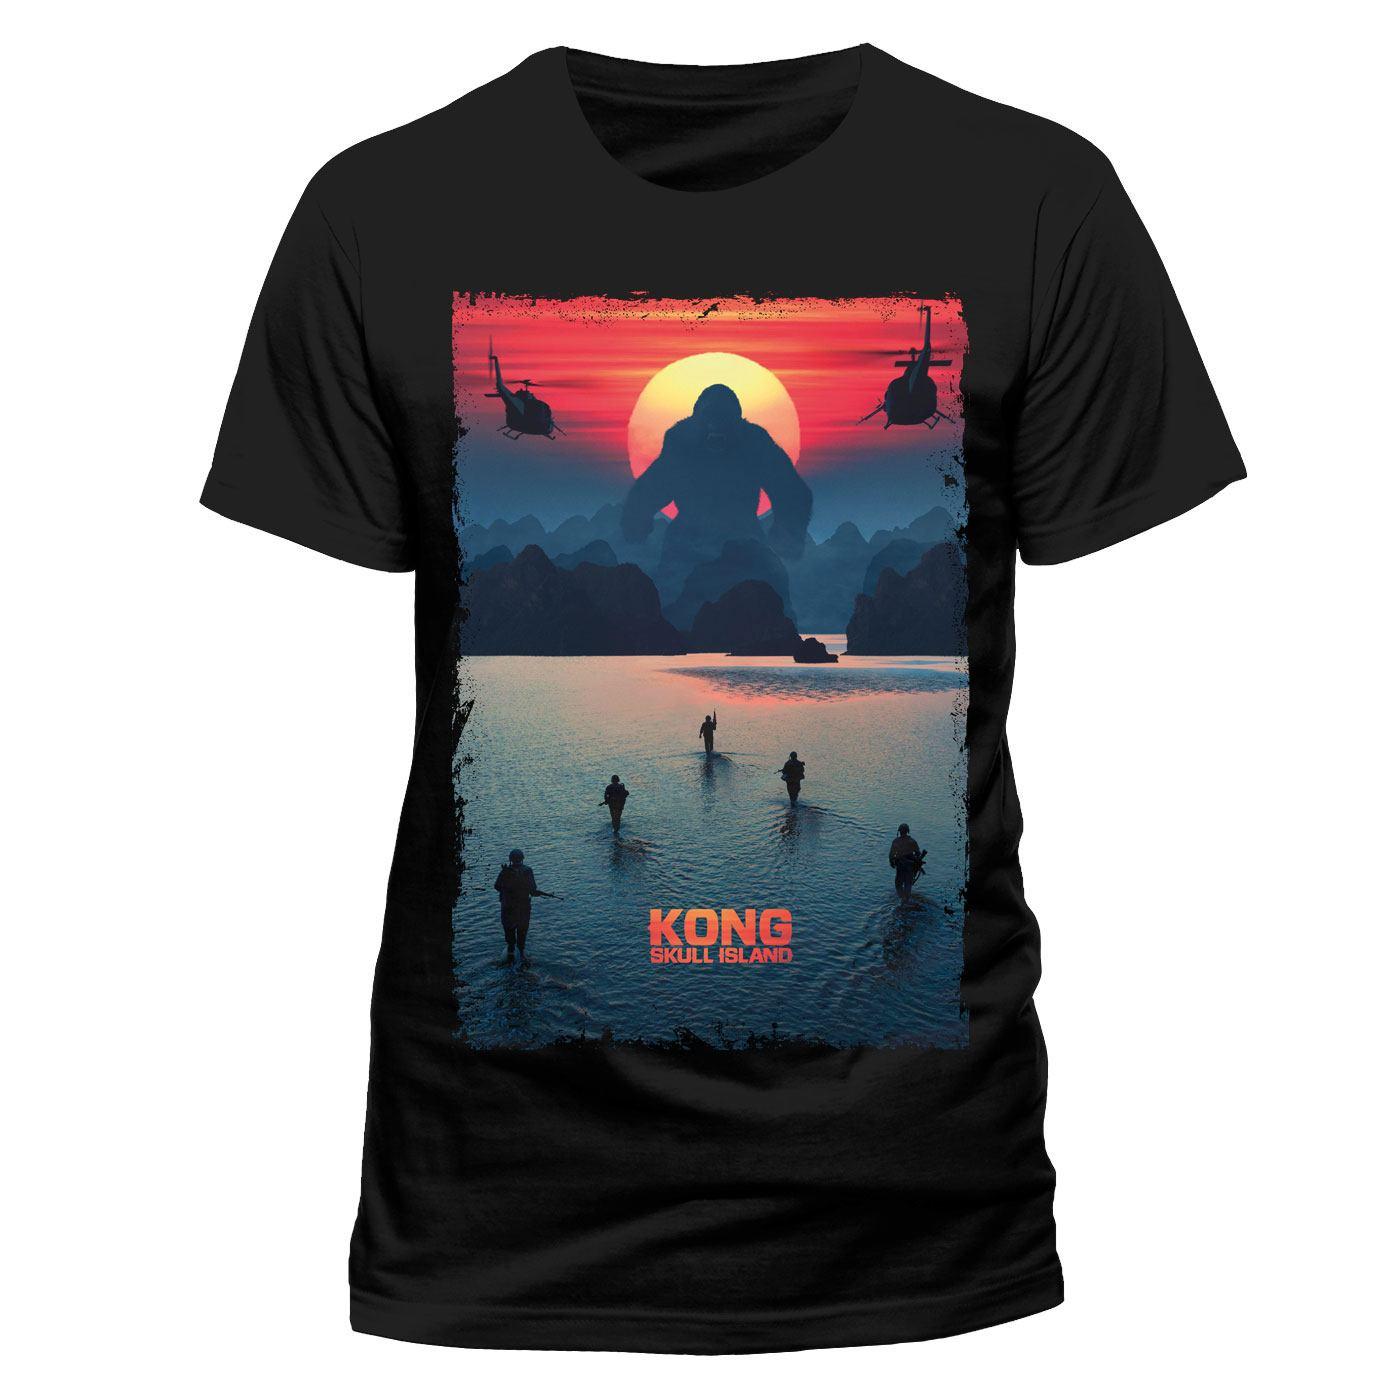 Kong Skull Island T-Shirt Poster Size XXL